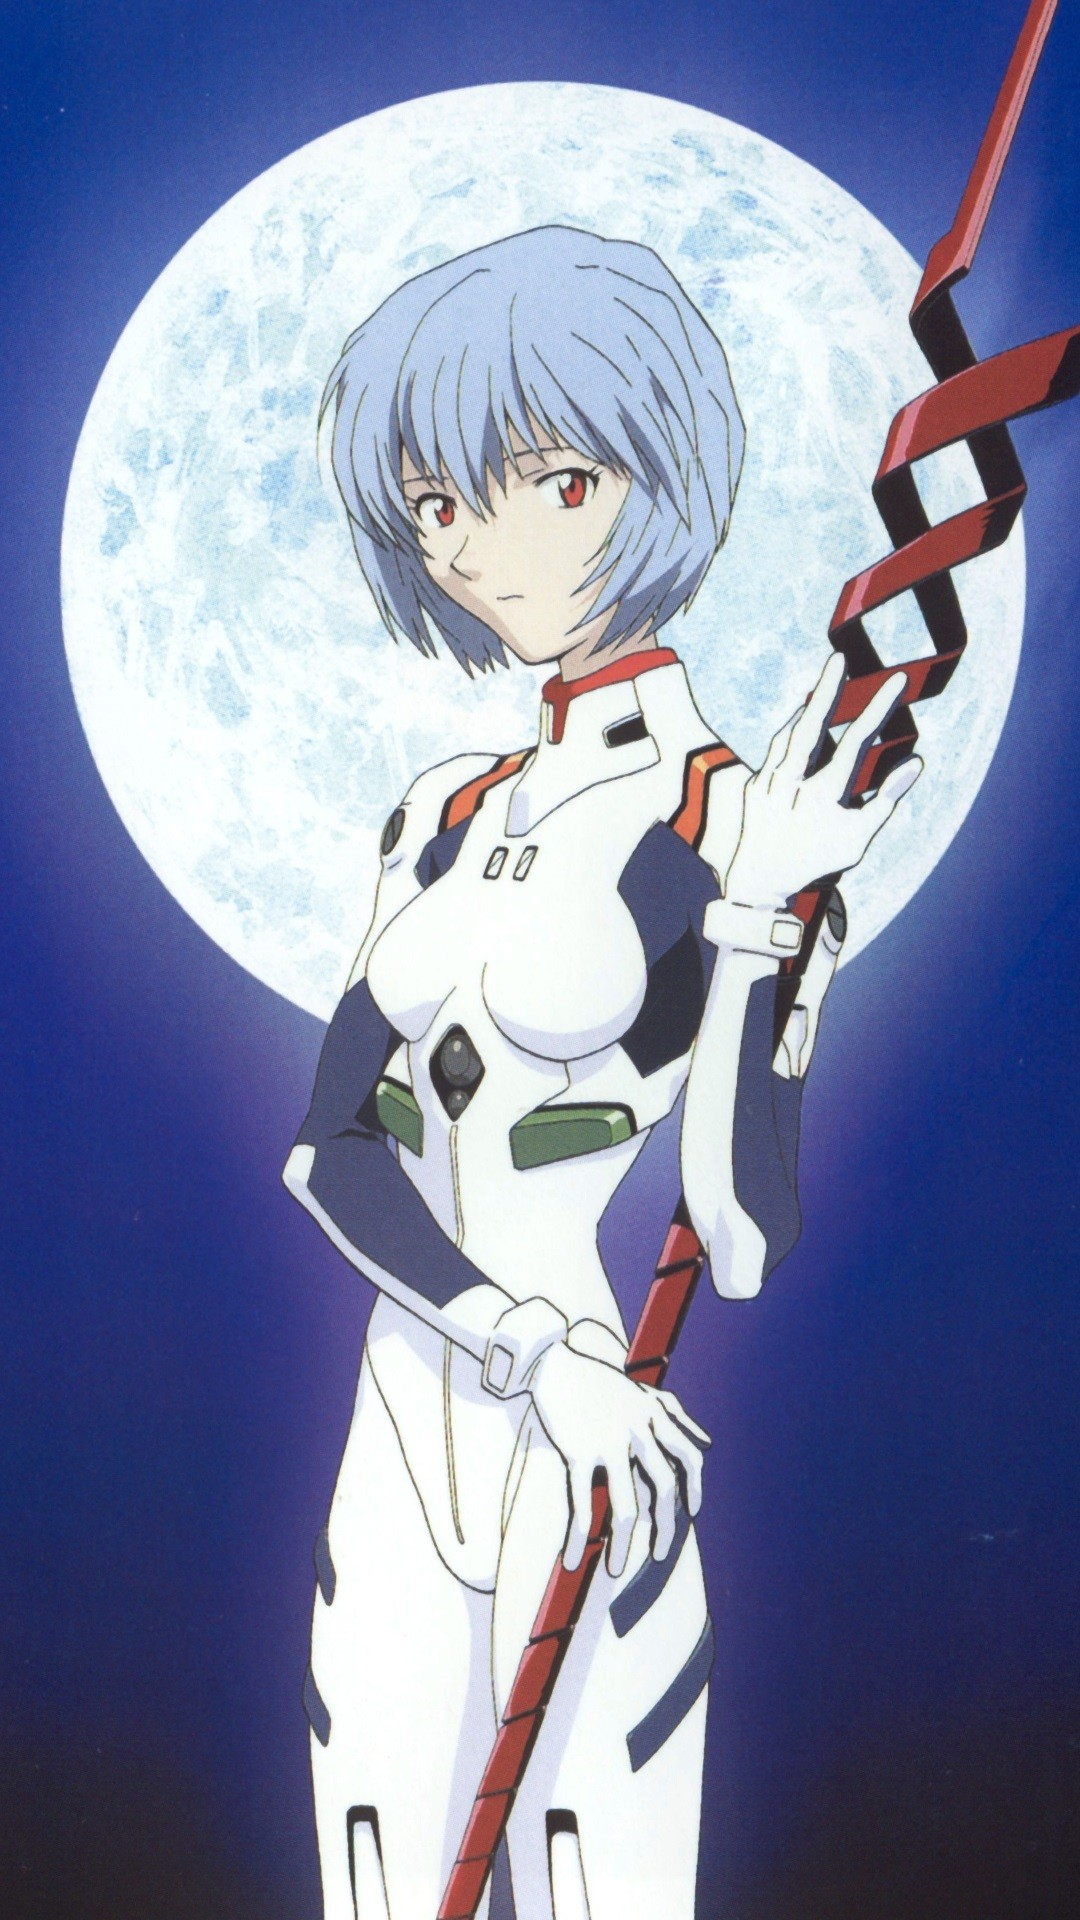 Neon Genesis Evangelion Rei Ayanami.iPhone 6 Plus wallpaper 1080×1920